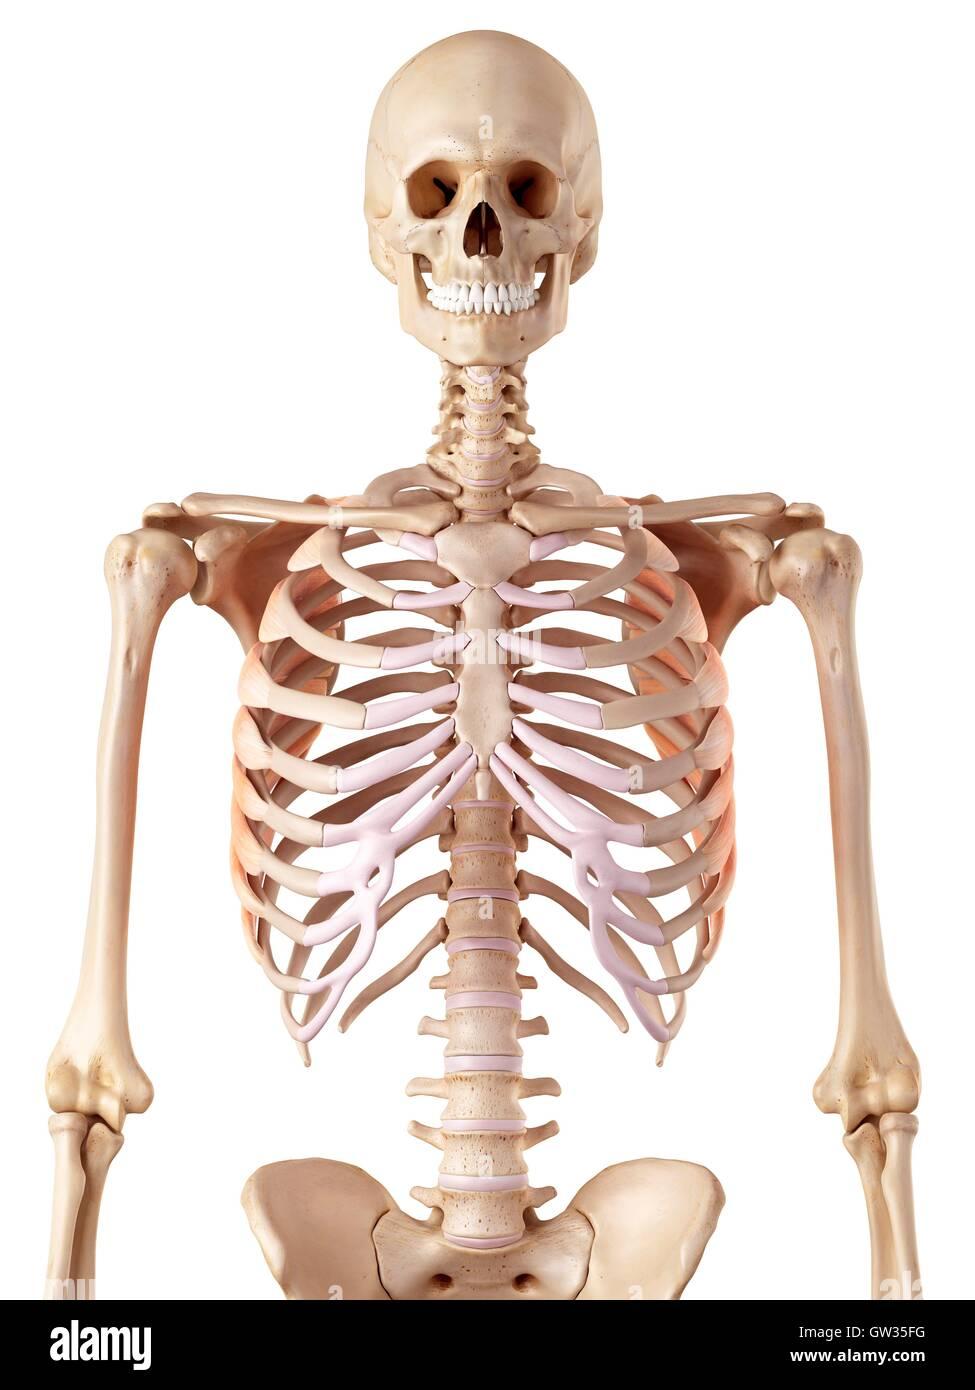 Human Rib Muscles Stock Photos & Human Rib Muscles Stock Images - Alamy